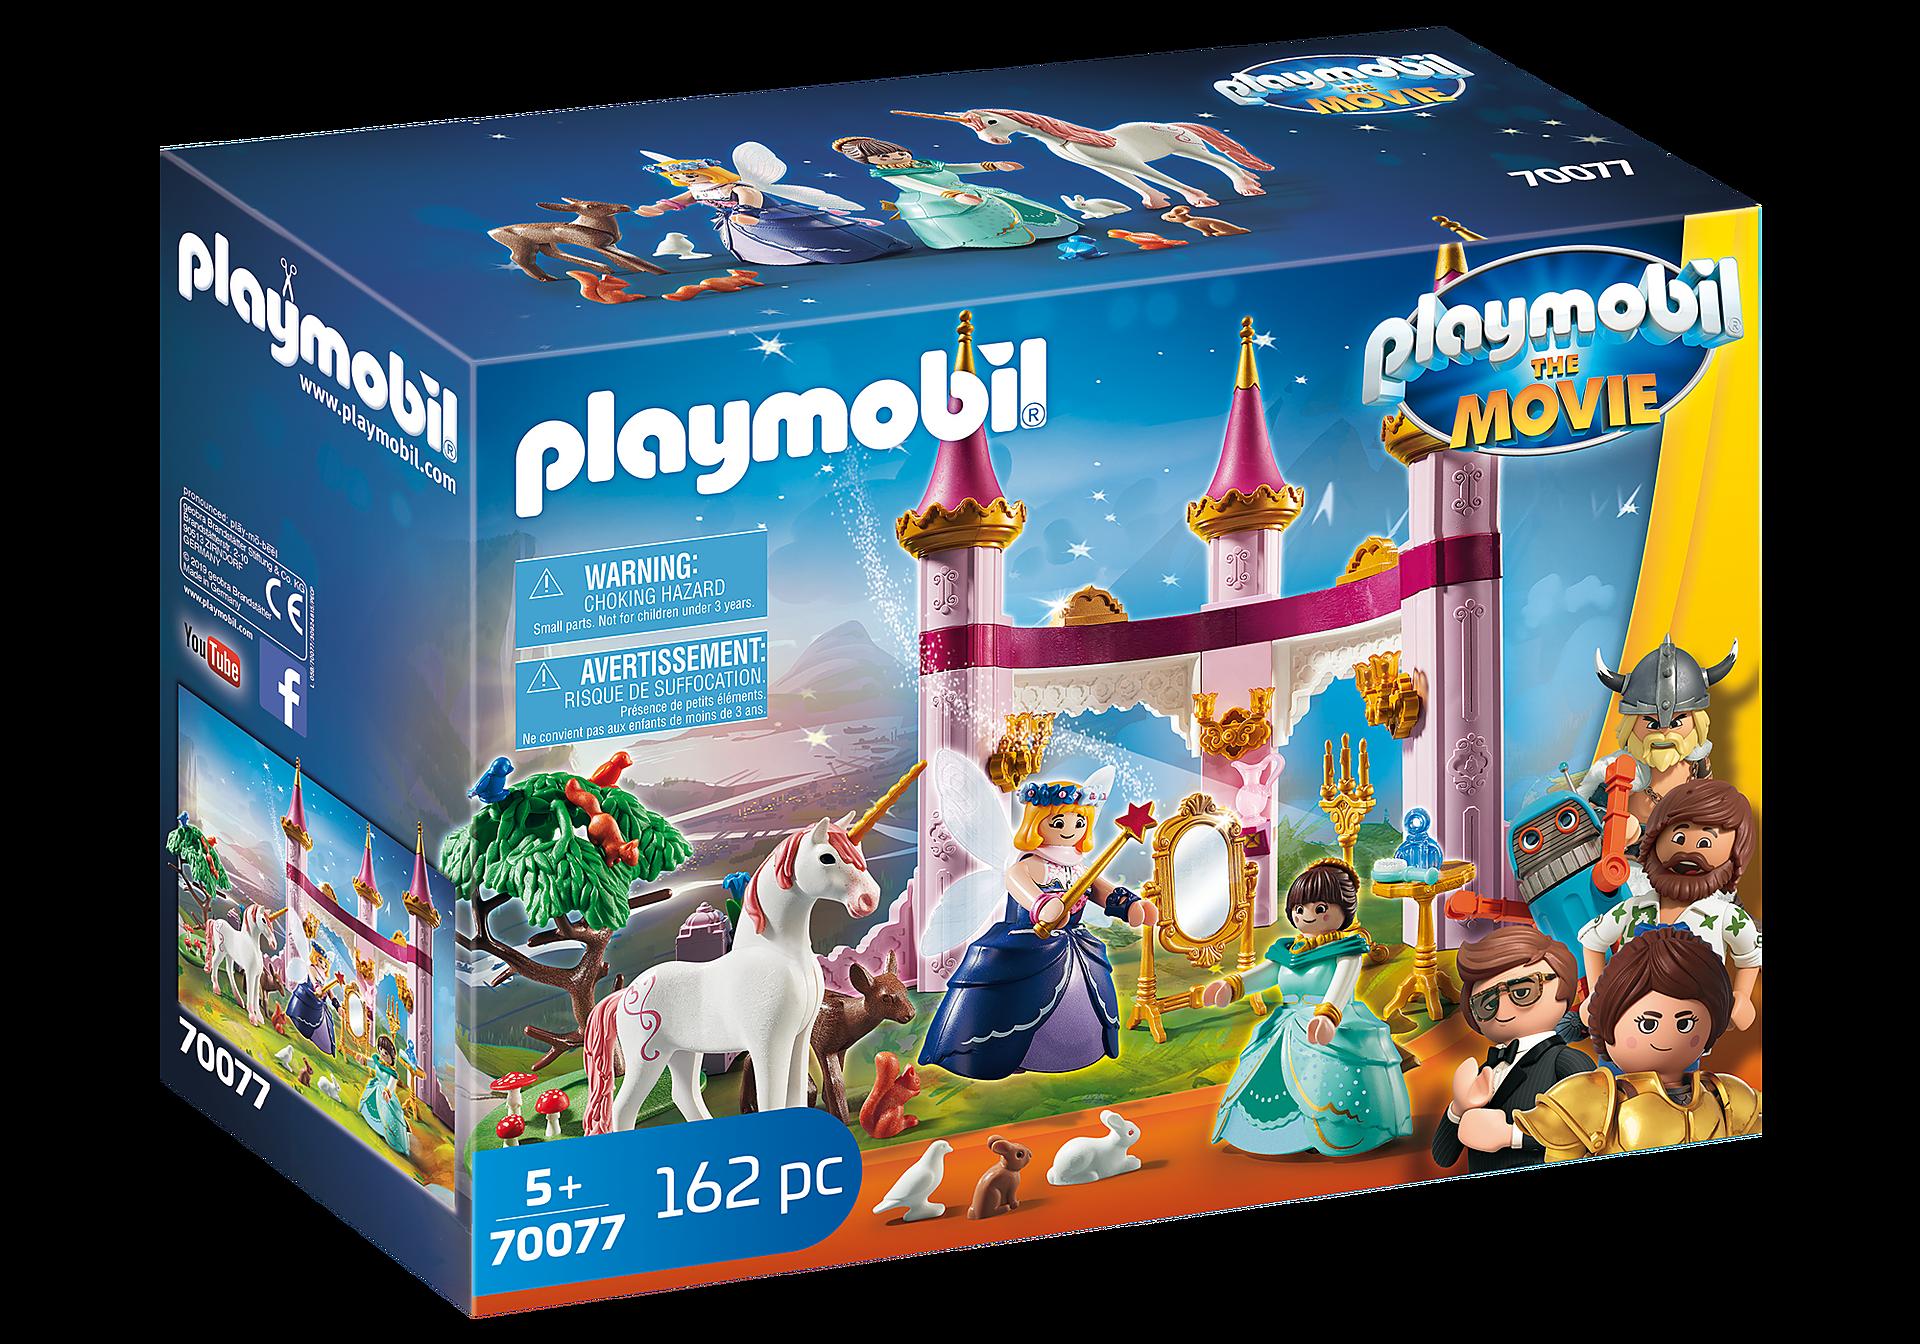 http://media.playmobil.com/i/playmobil/70077_product_box_front/PLAYMOBIL: THE MOVIE Marla et château enchanté